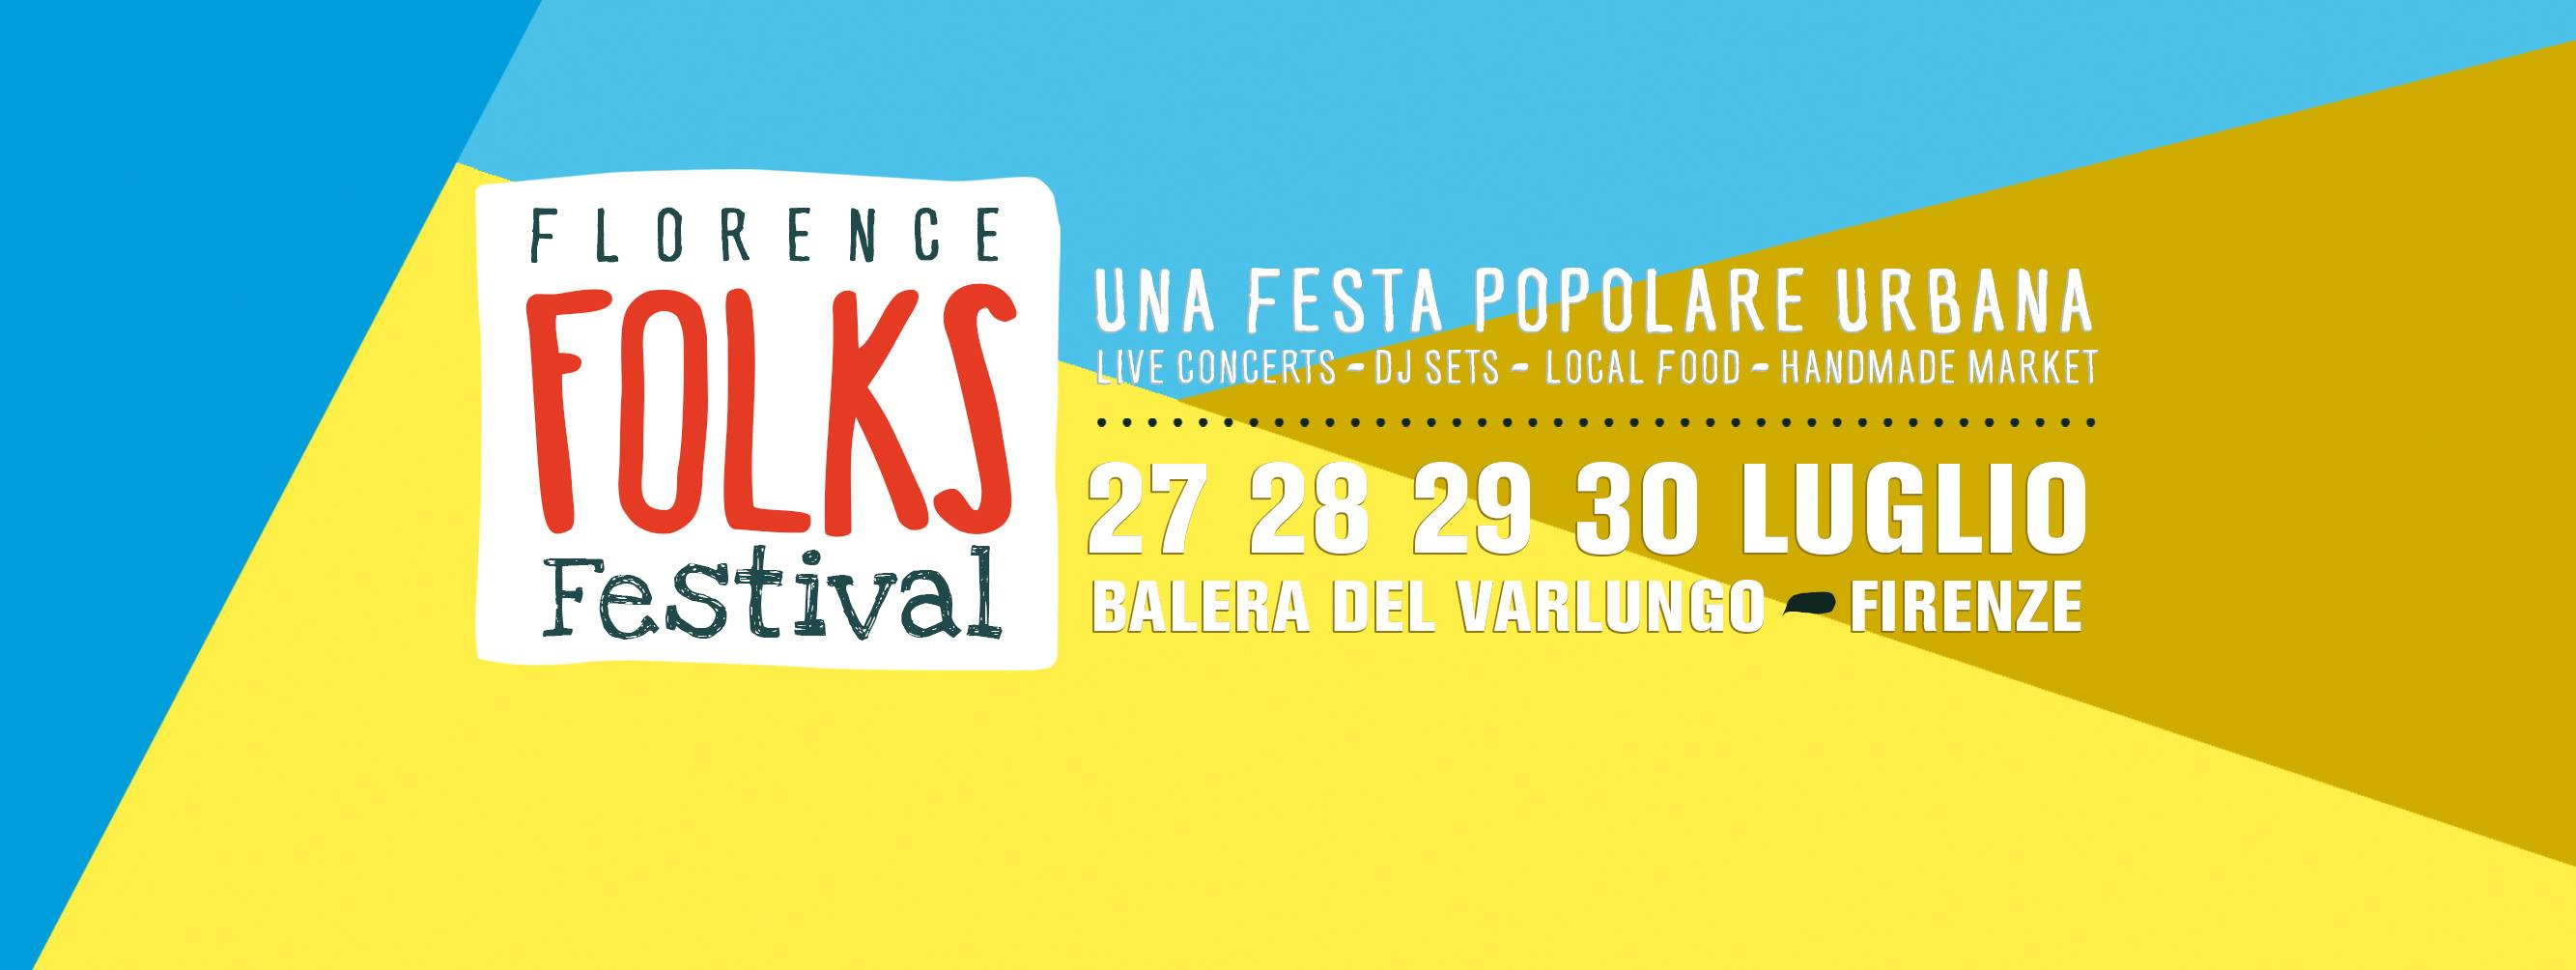 Florence Folk festival Firenze 27 -30 luglio 2017